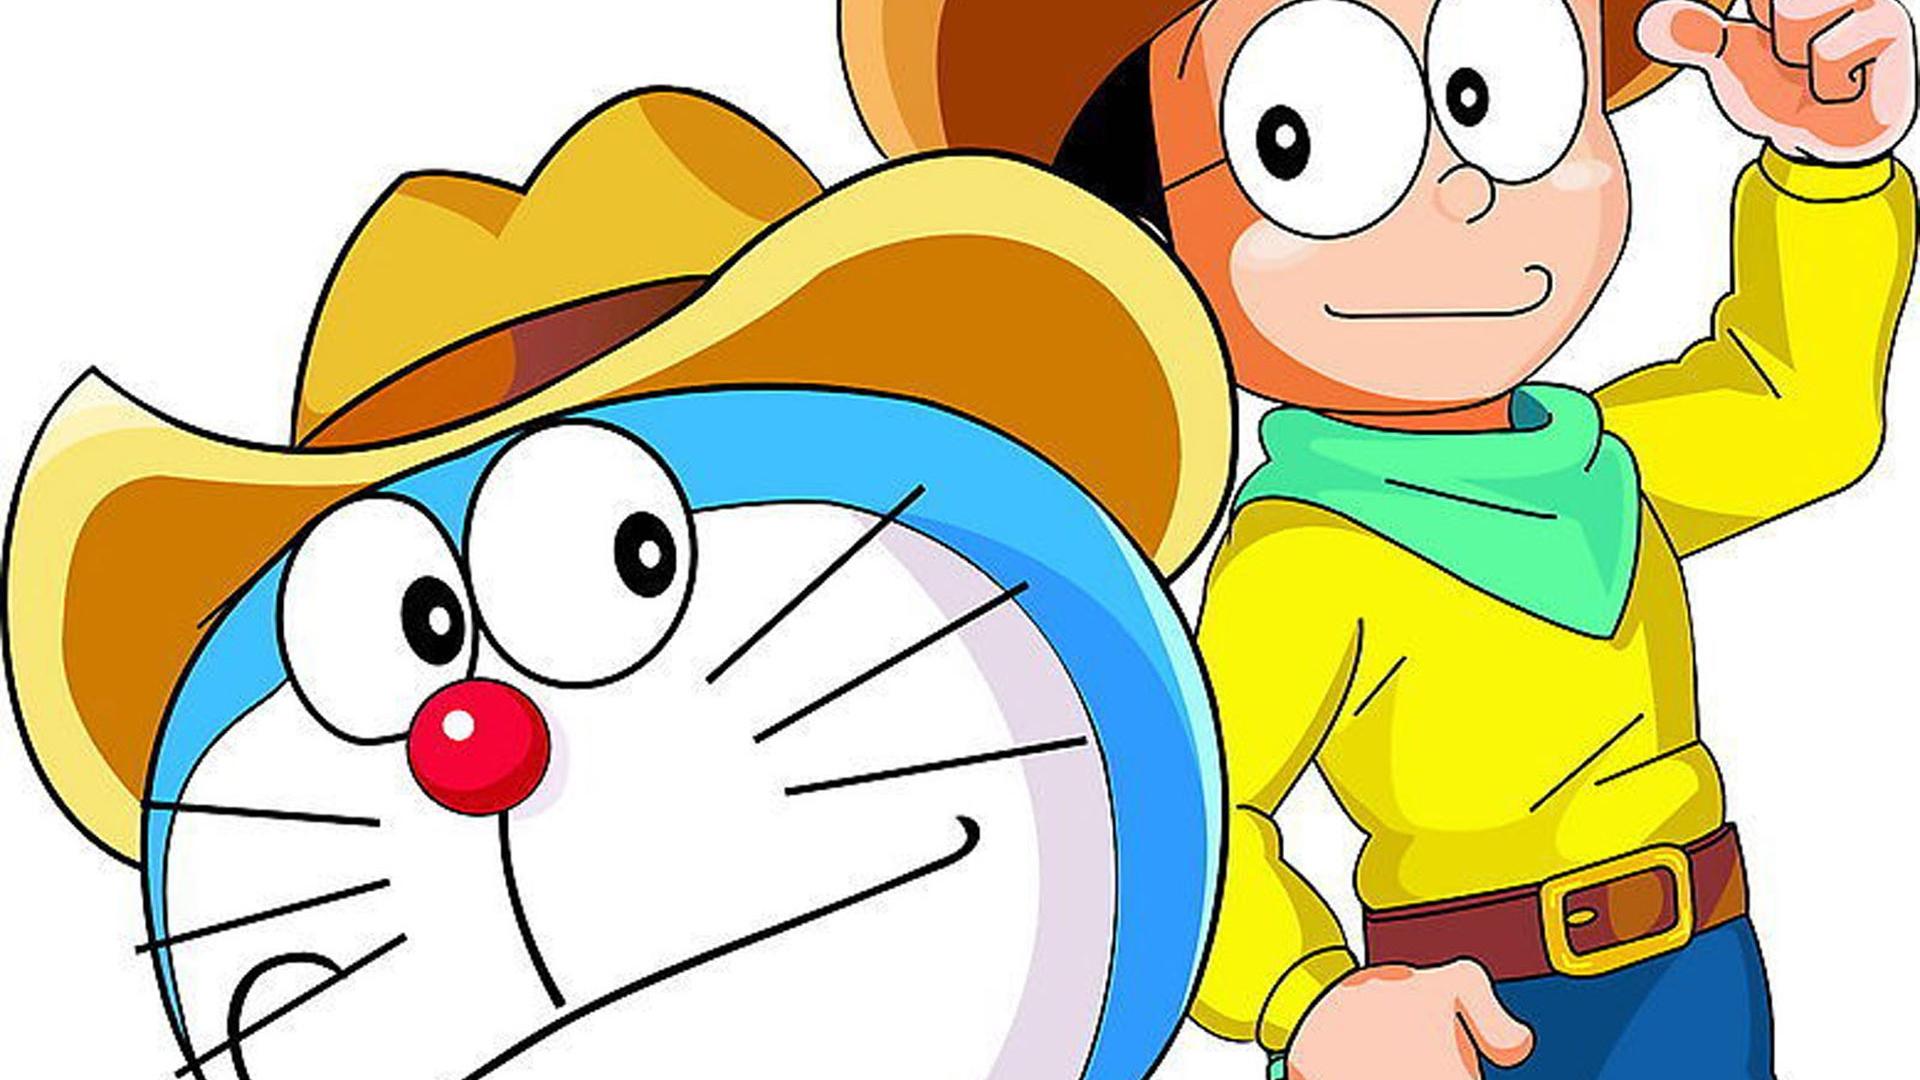 Free Download Doraemon Anime Cartoon Wallpapers Hd 10098 Wallpaper